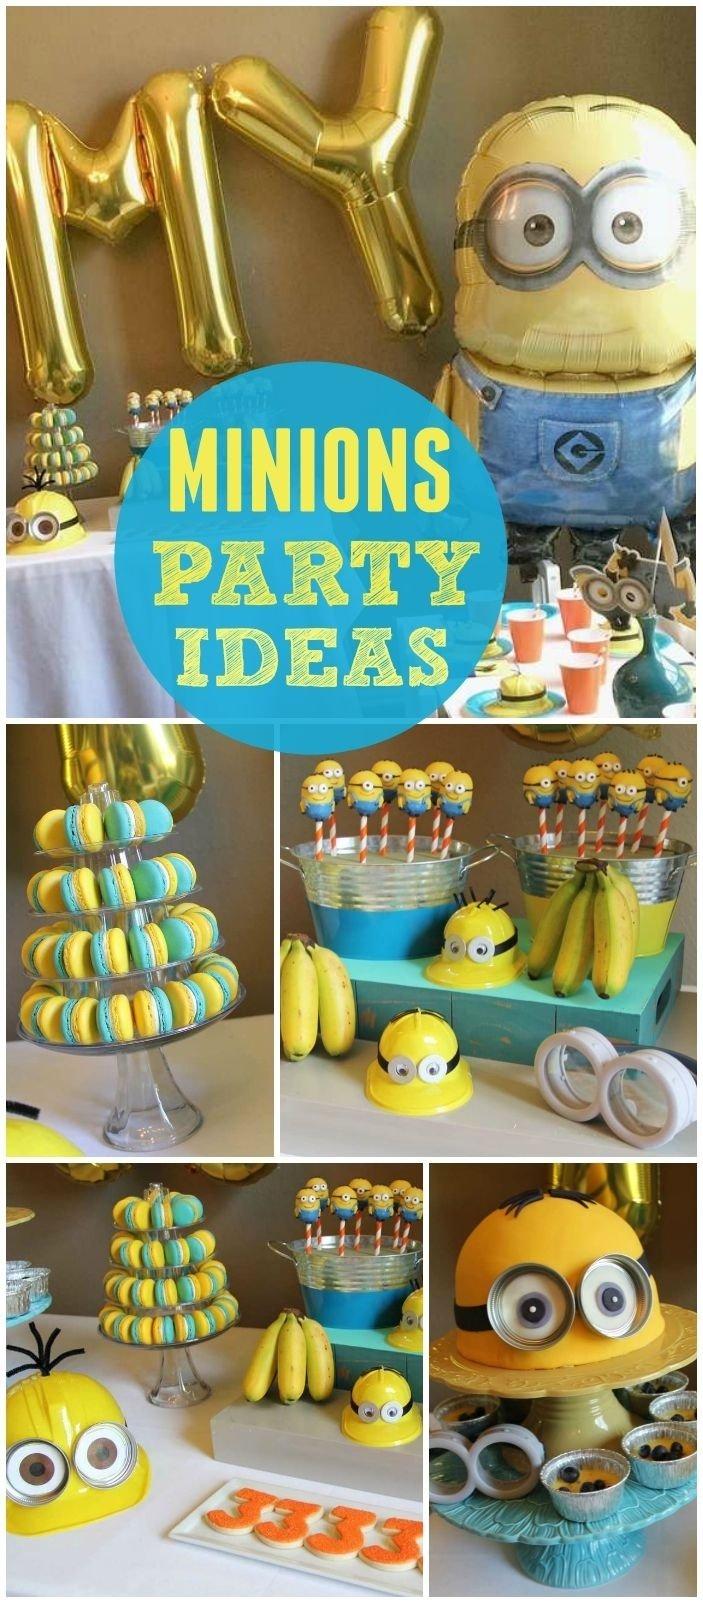 10 Nice Despicable Me 2 Birthday Party Ideas 52 best minions images on pinterest birthdays ideas para fiestas 2020